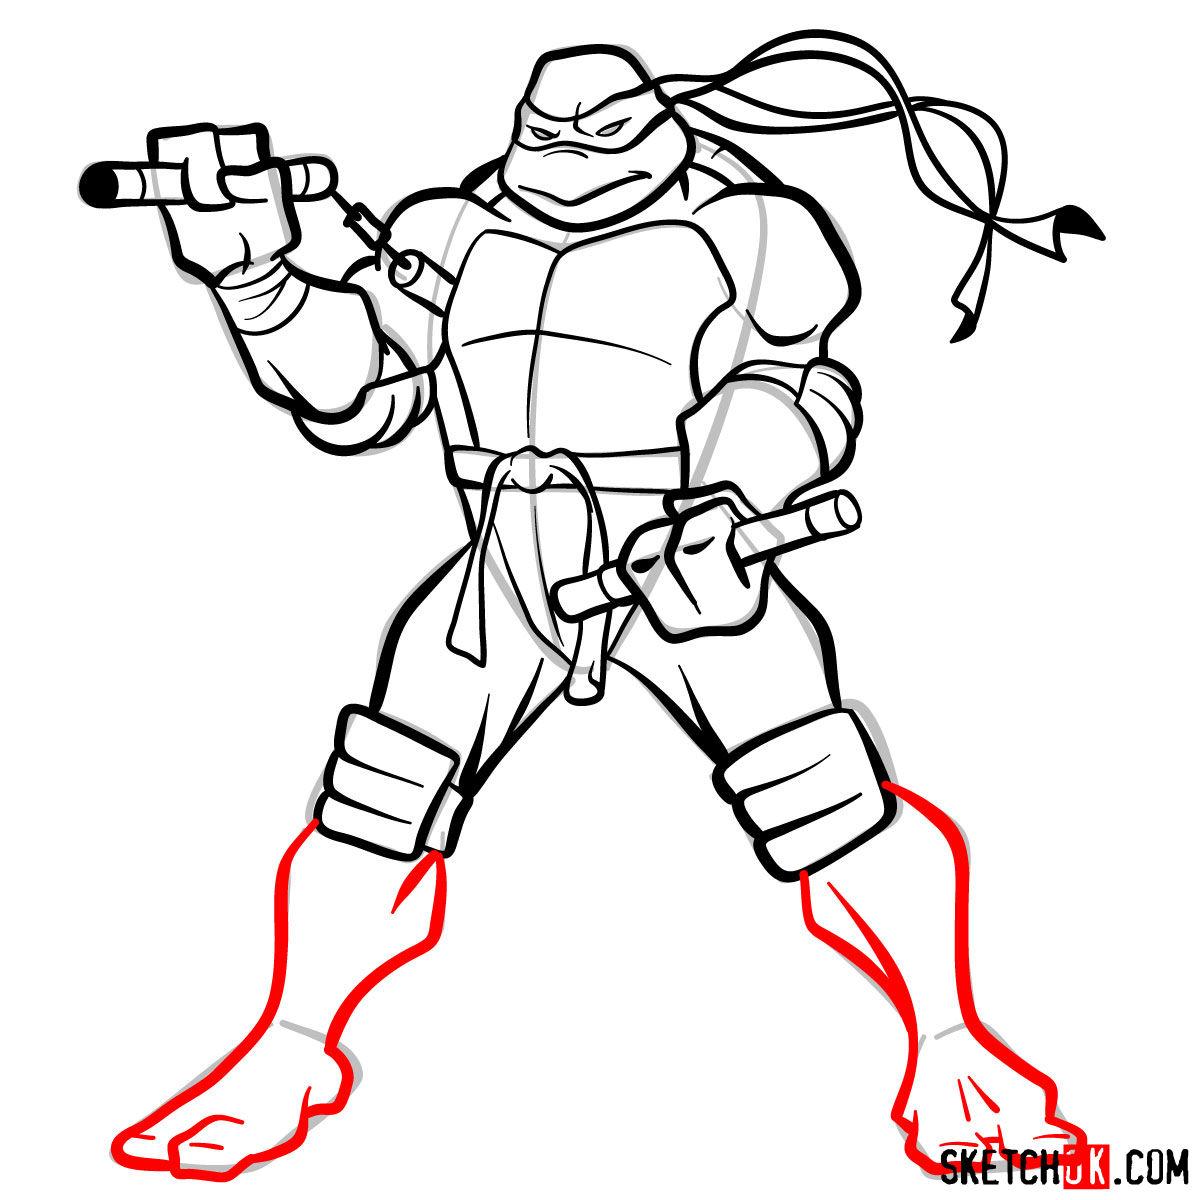 How to draw Michaelangelo ninja turtle - step 12